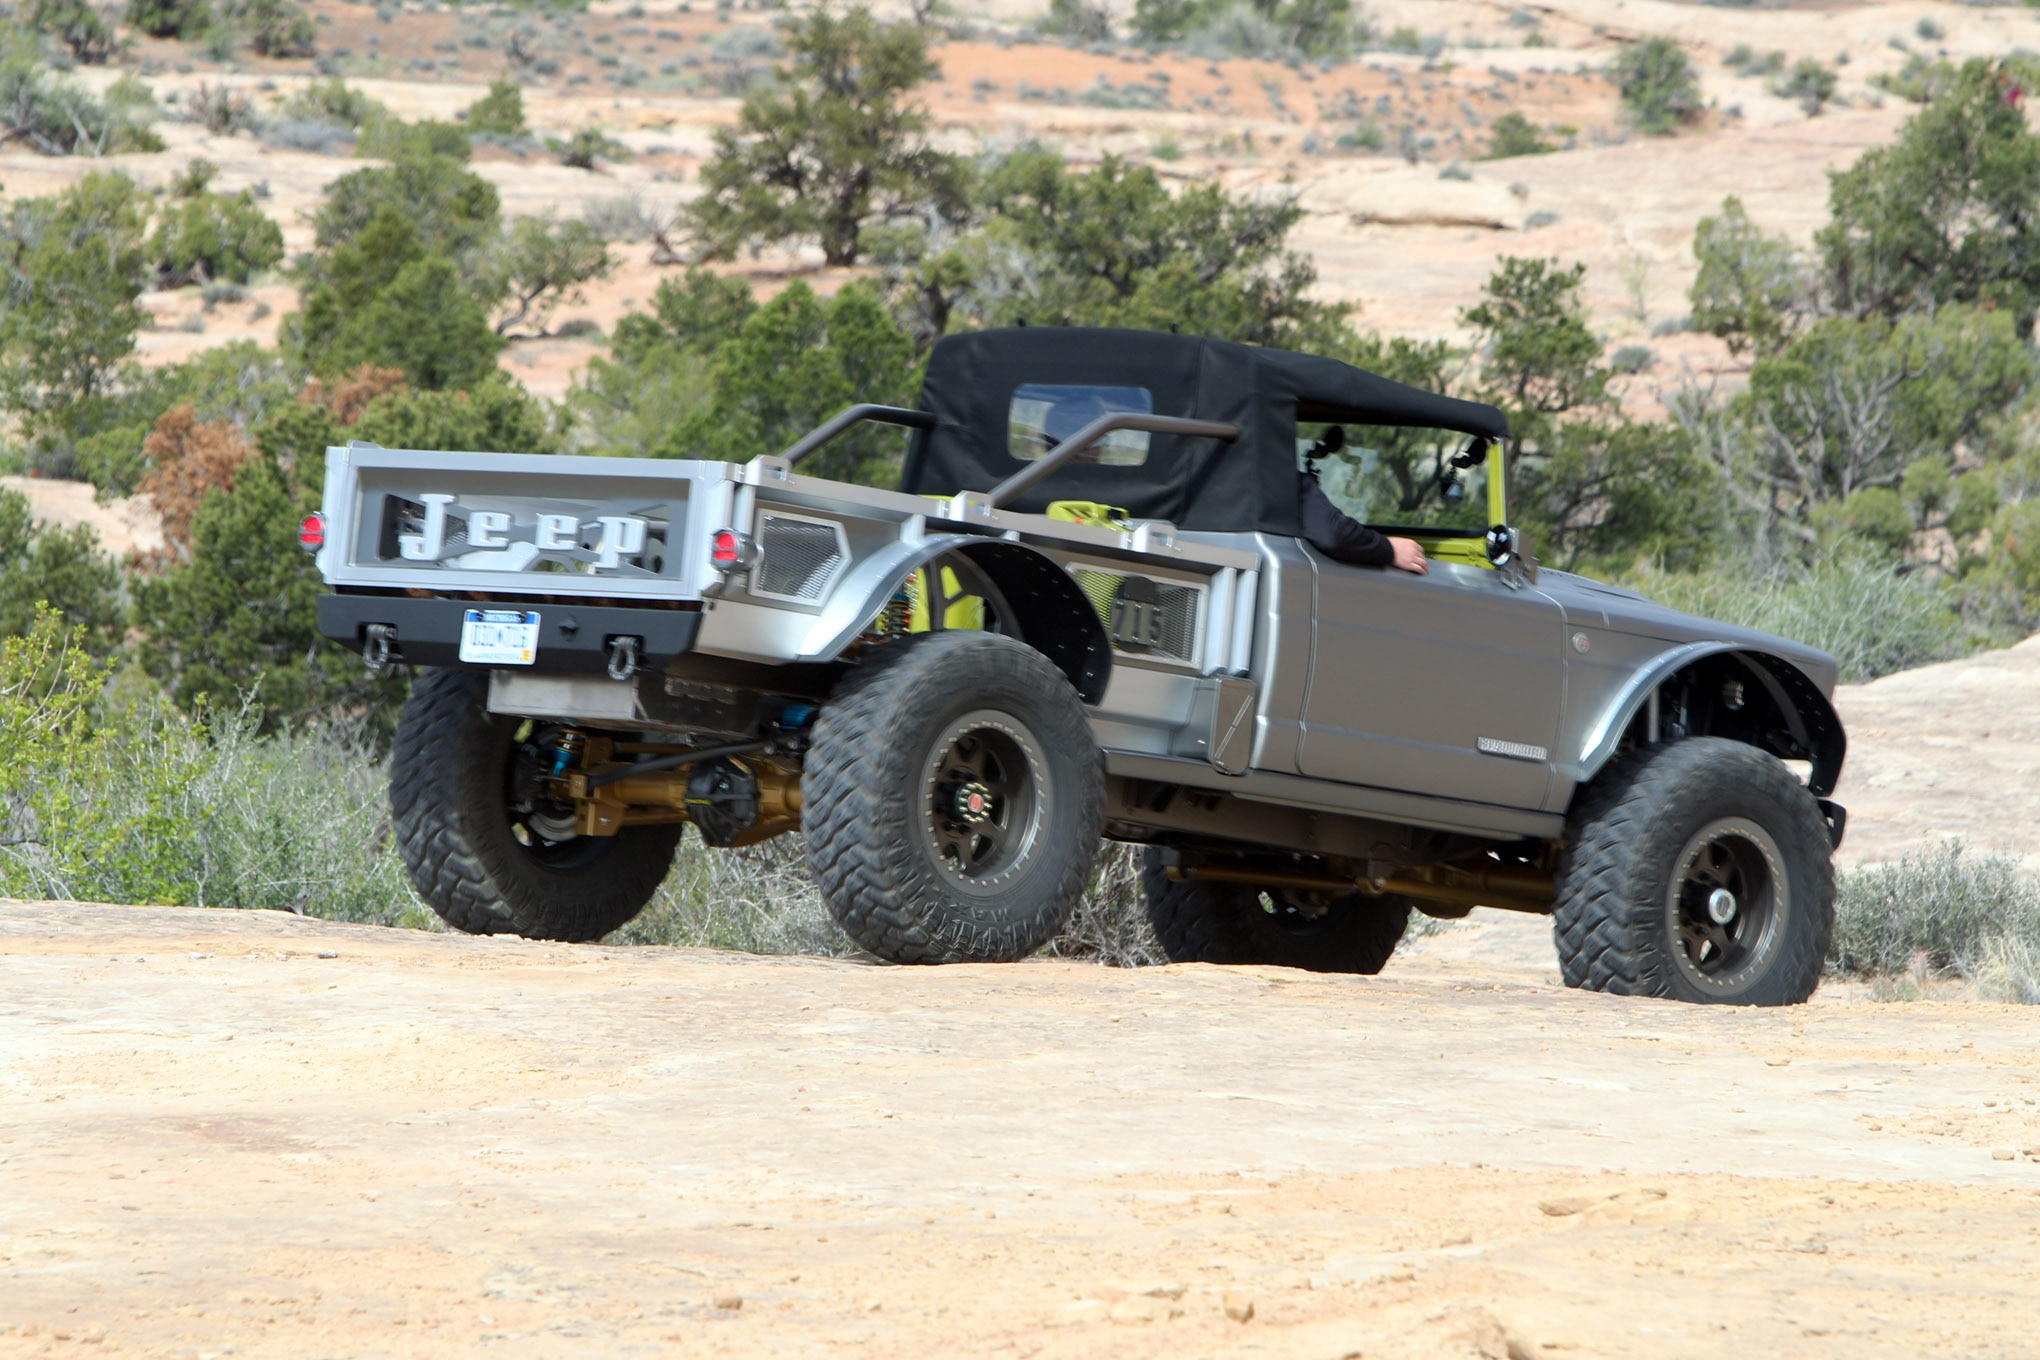 2019 jeep m715 five quarter lead